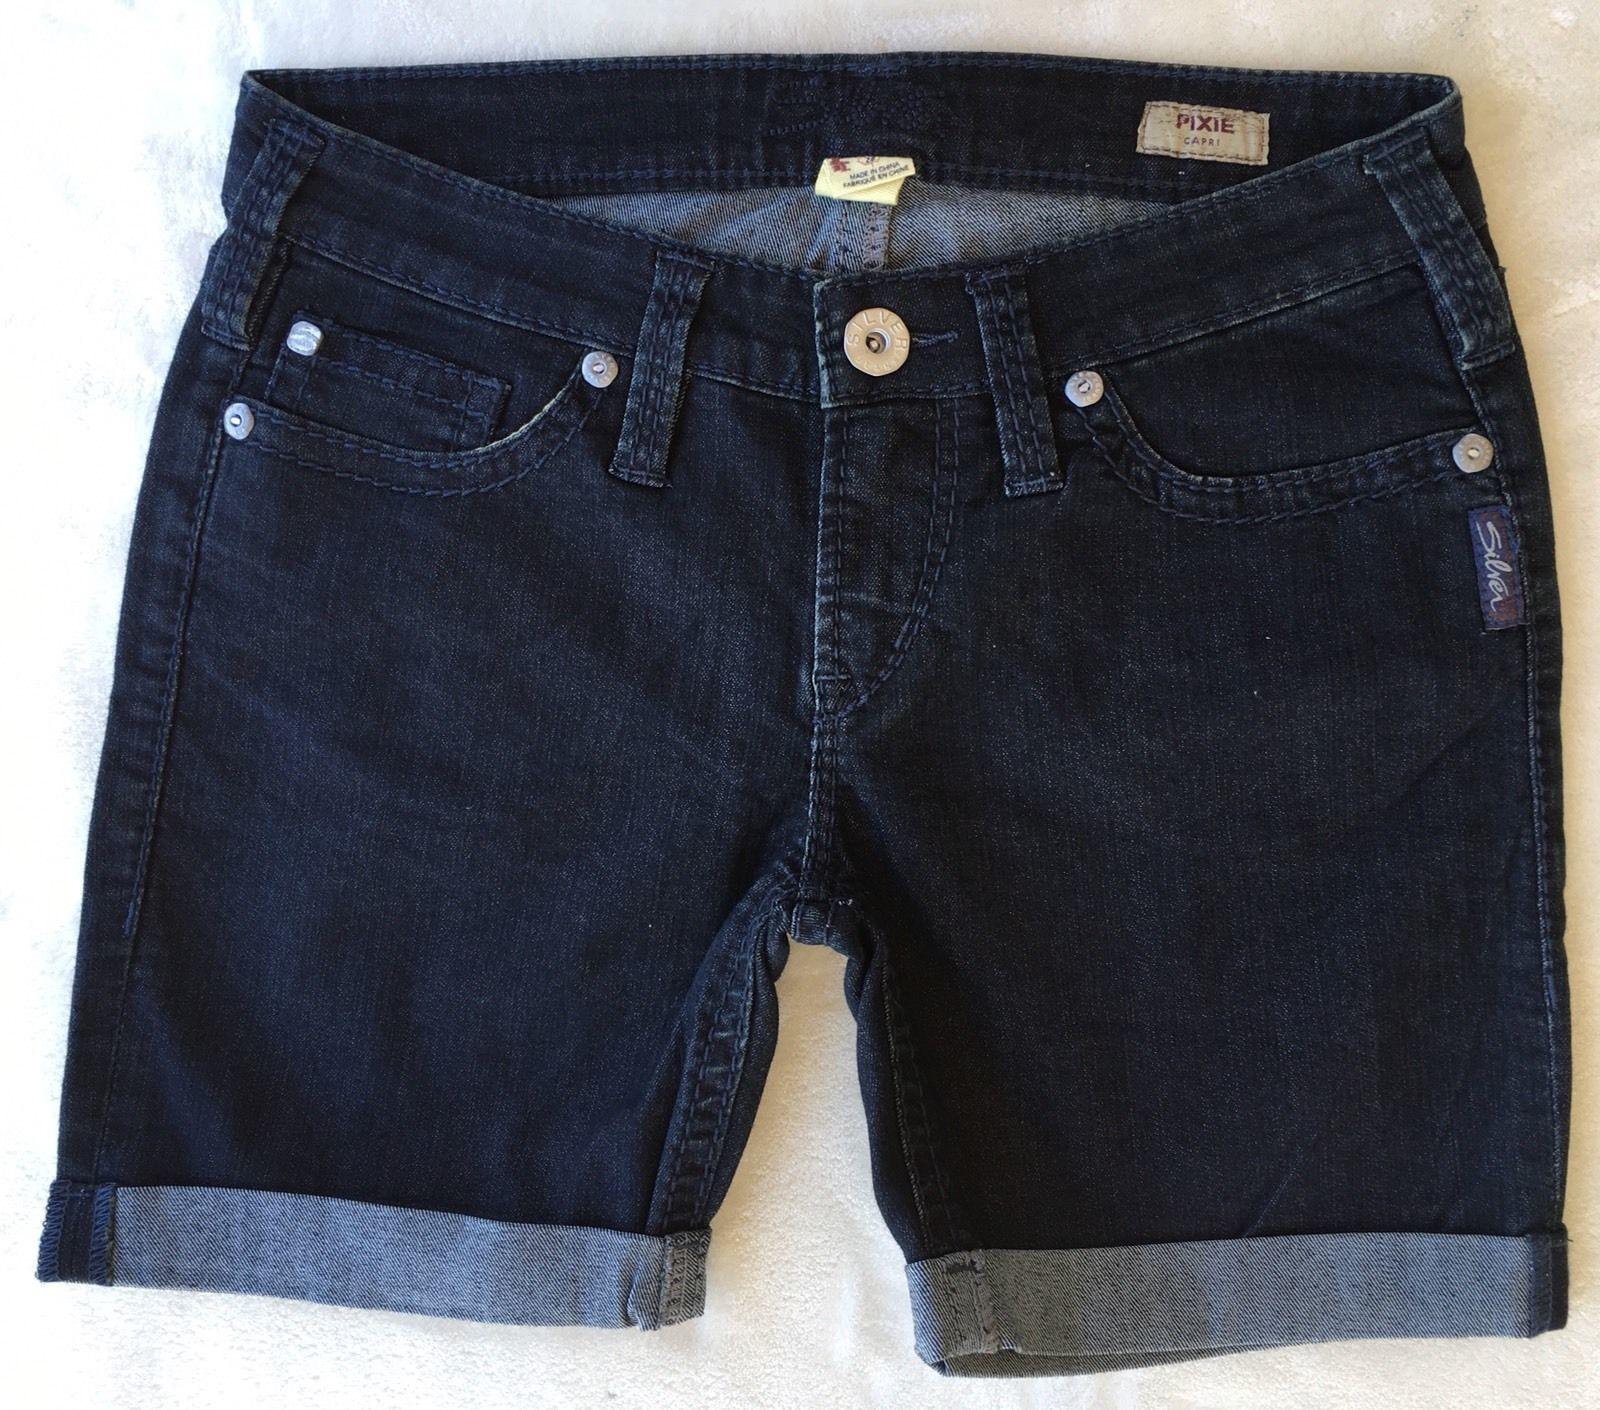 SILVER Jeans Sale Buckle Low Rise Pixie Dark Denim Stretch Jean Mid Shorts 28